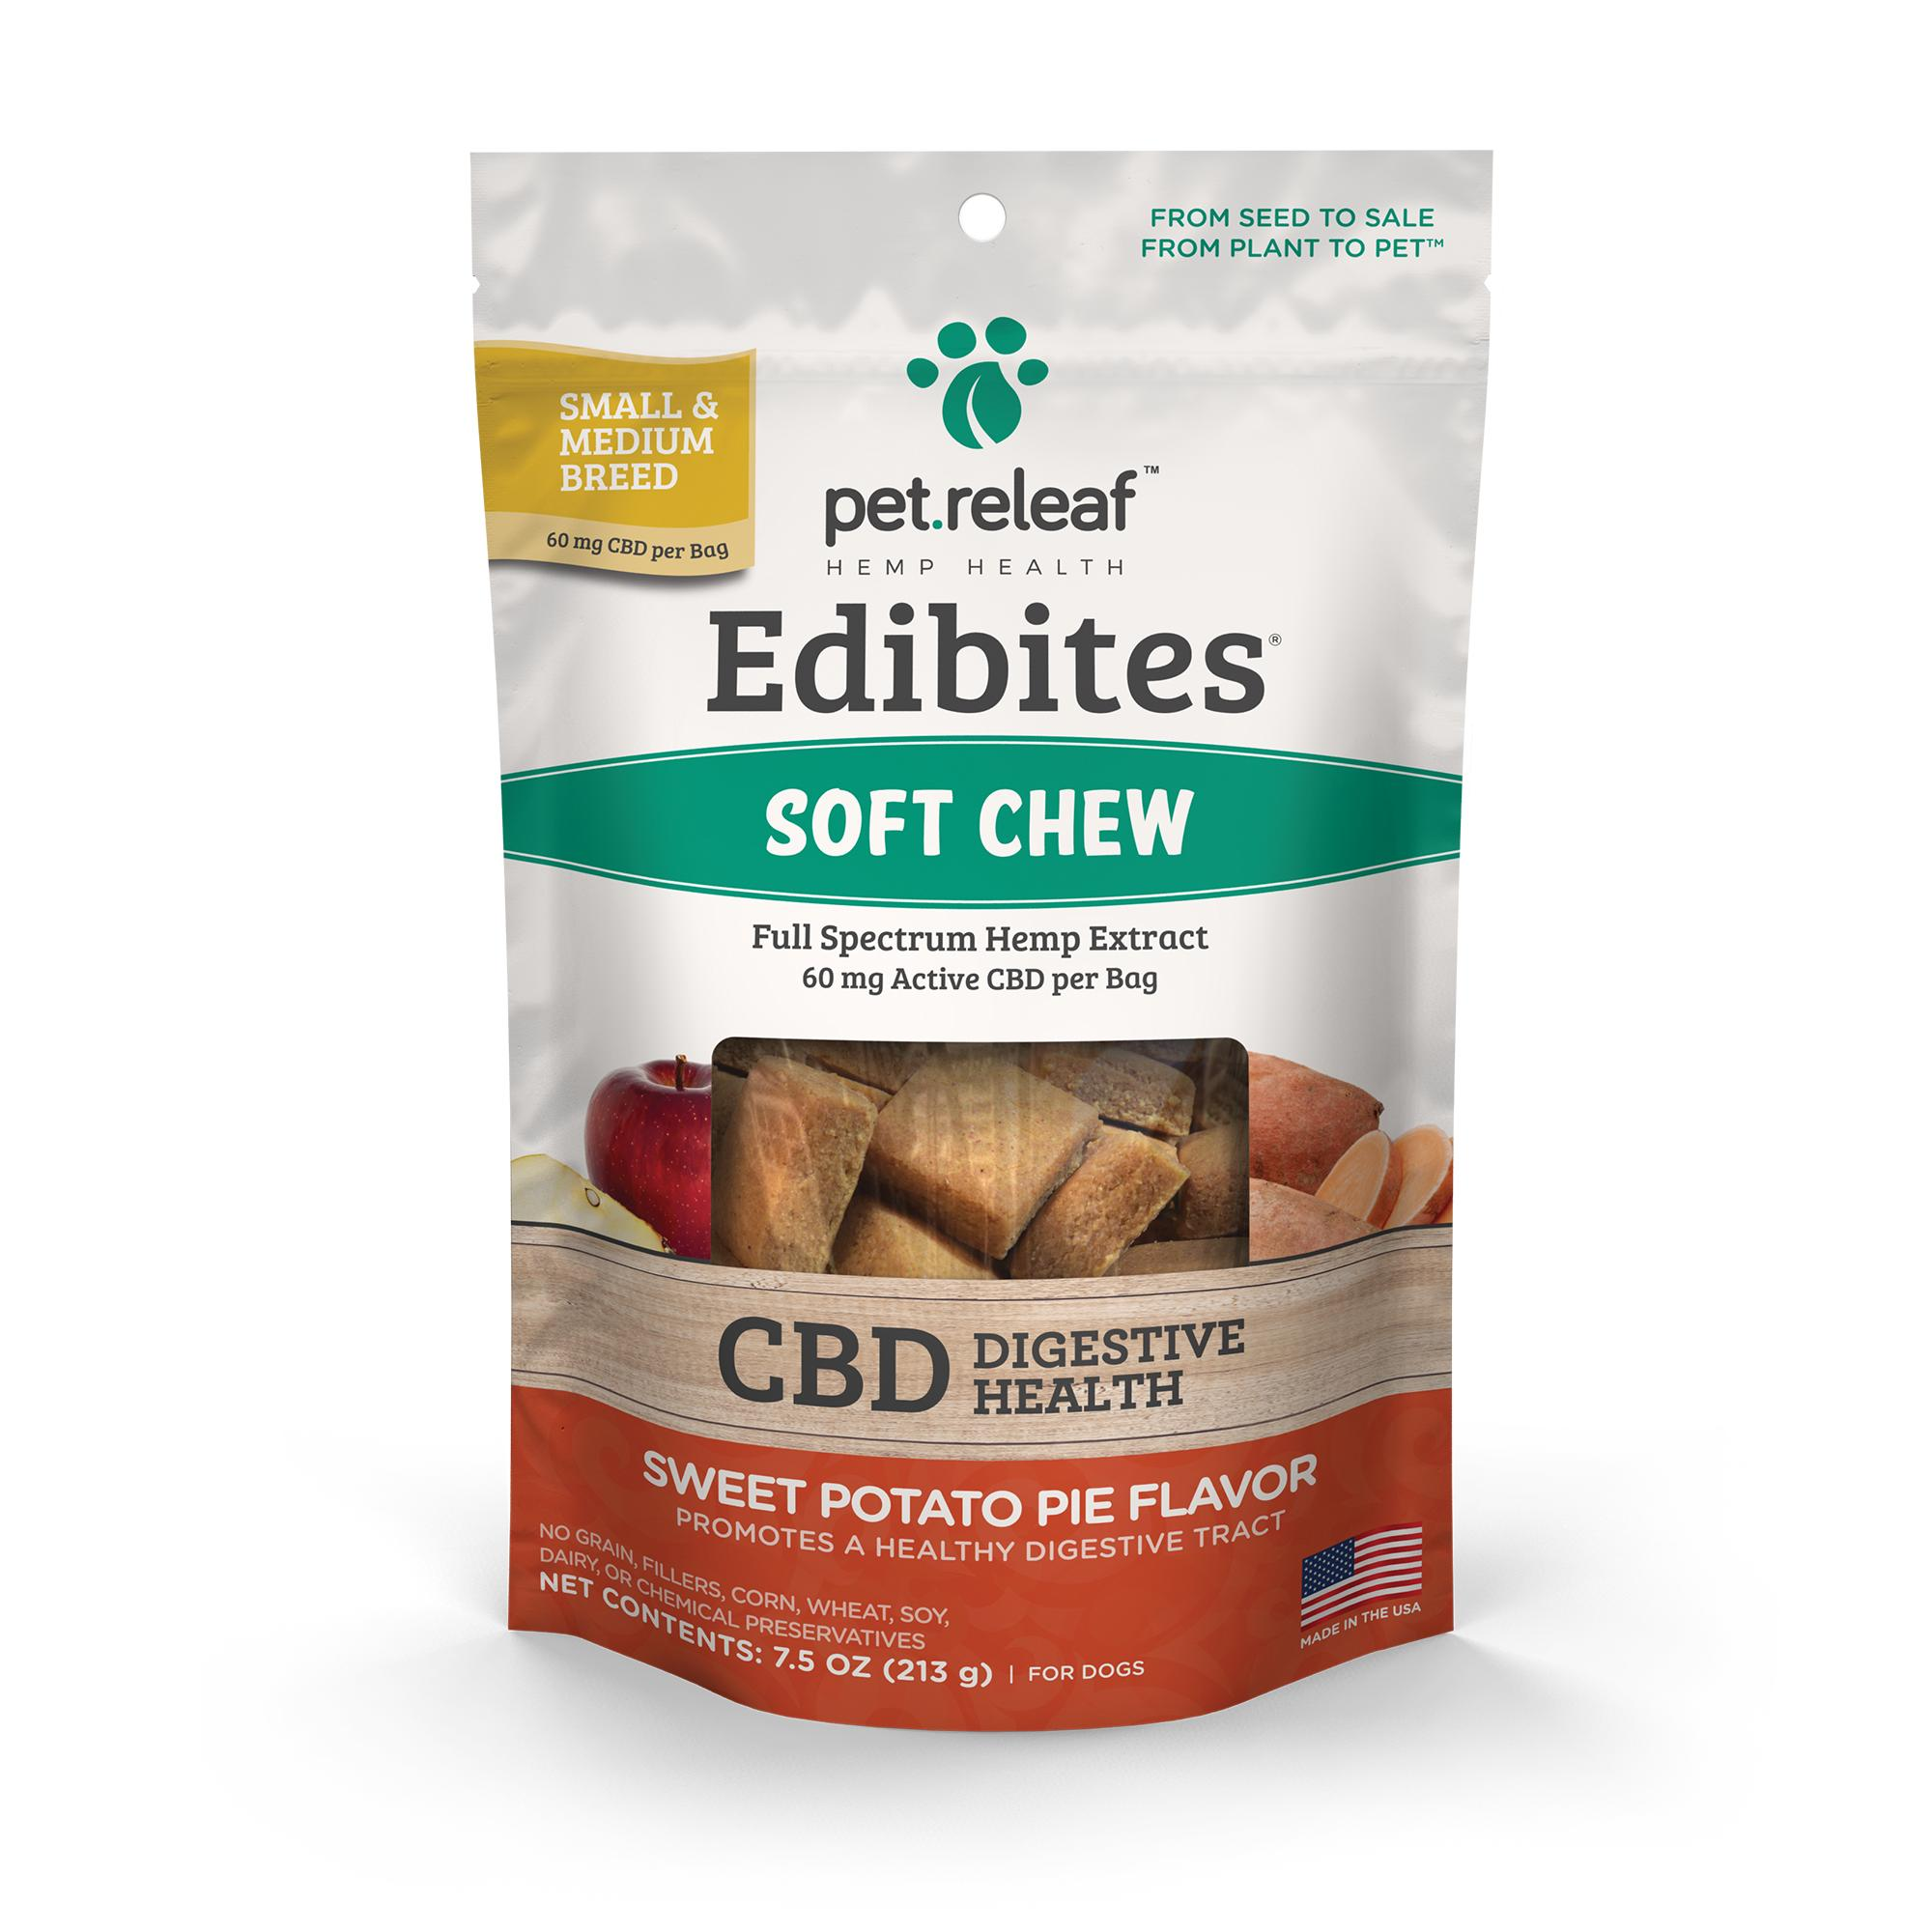 Pet Releaf Edibites Soft Chew Digestive Health Sweet Potato Small & Medium Breed Dog Suppliment Image